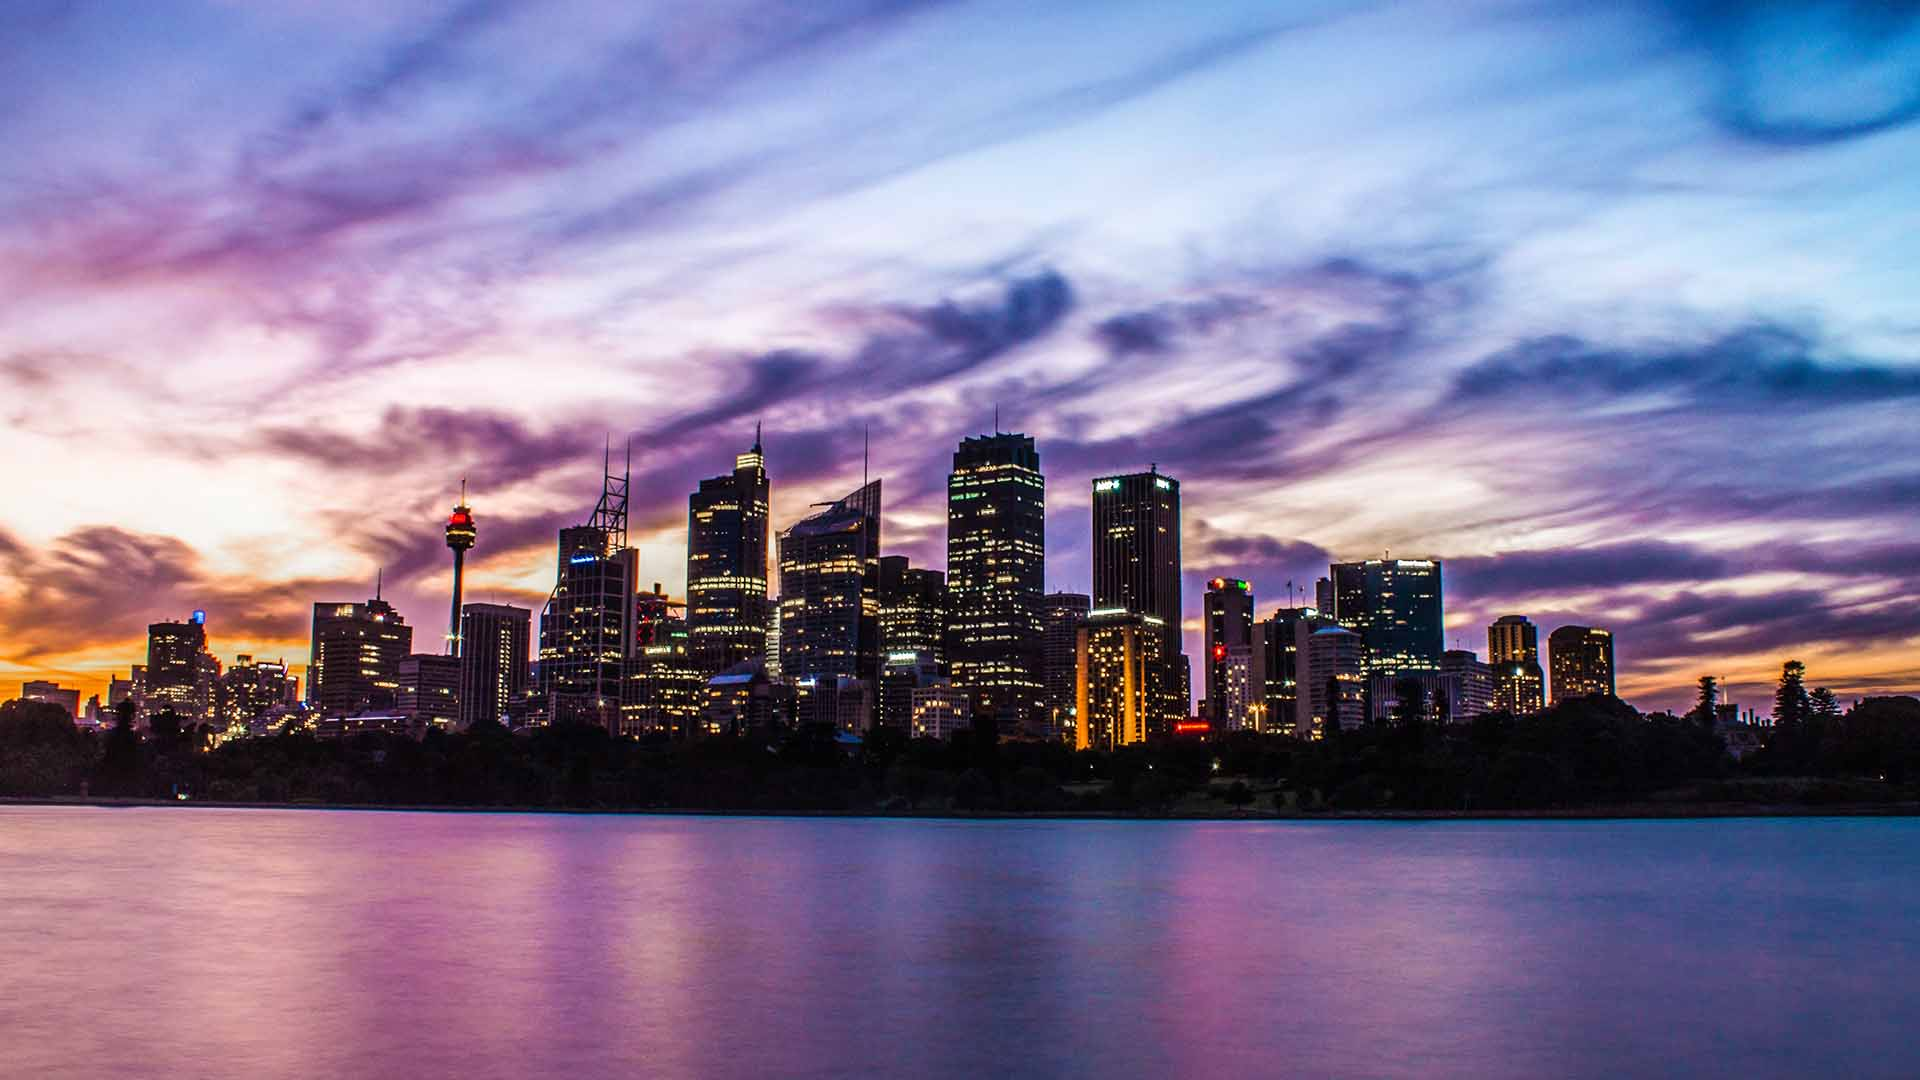 Sydney Australien Erkundungstour - Cover